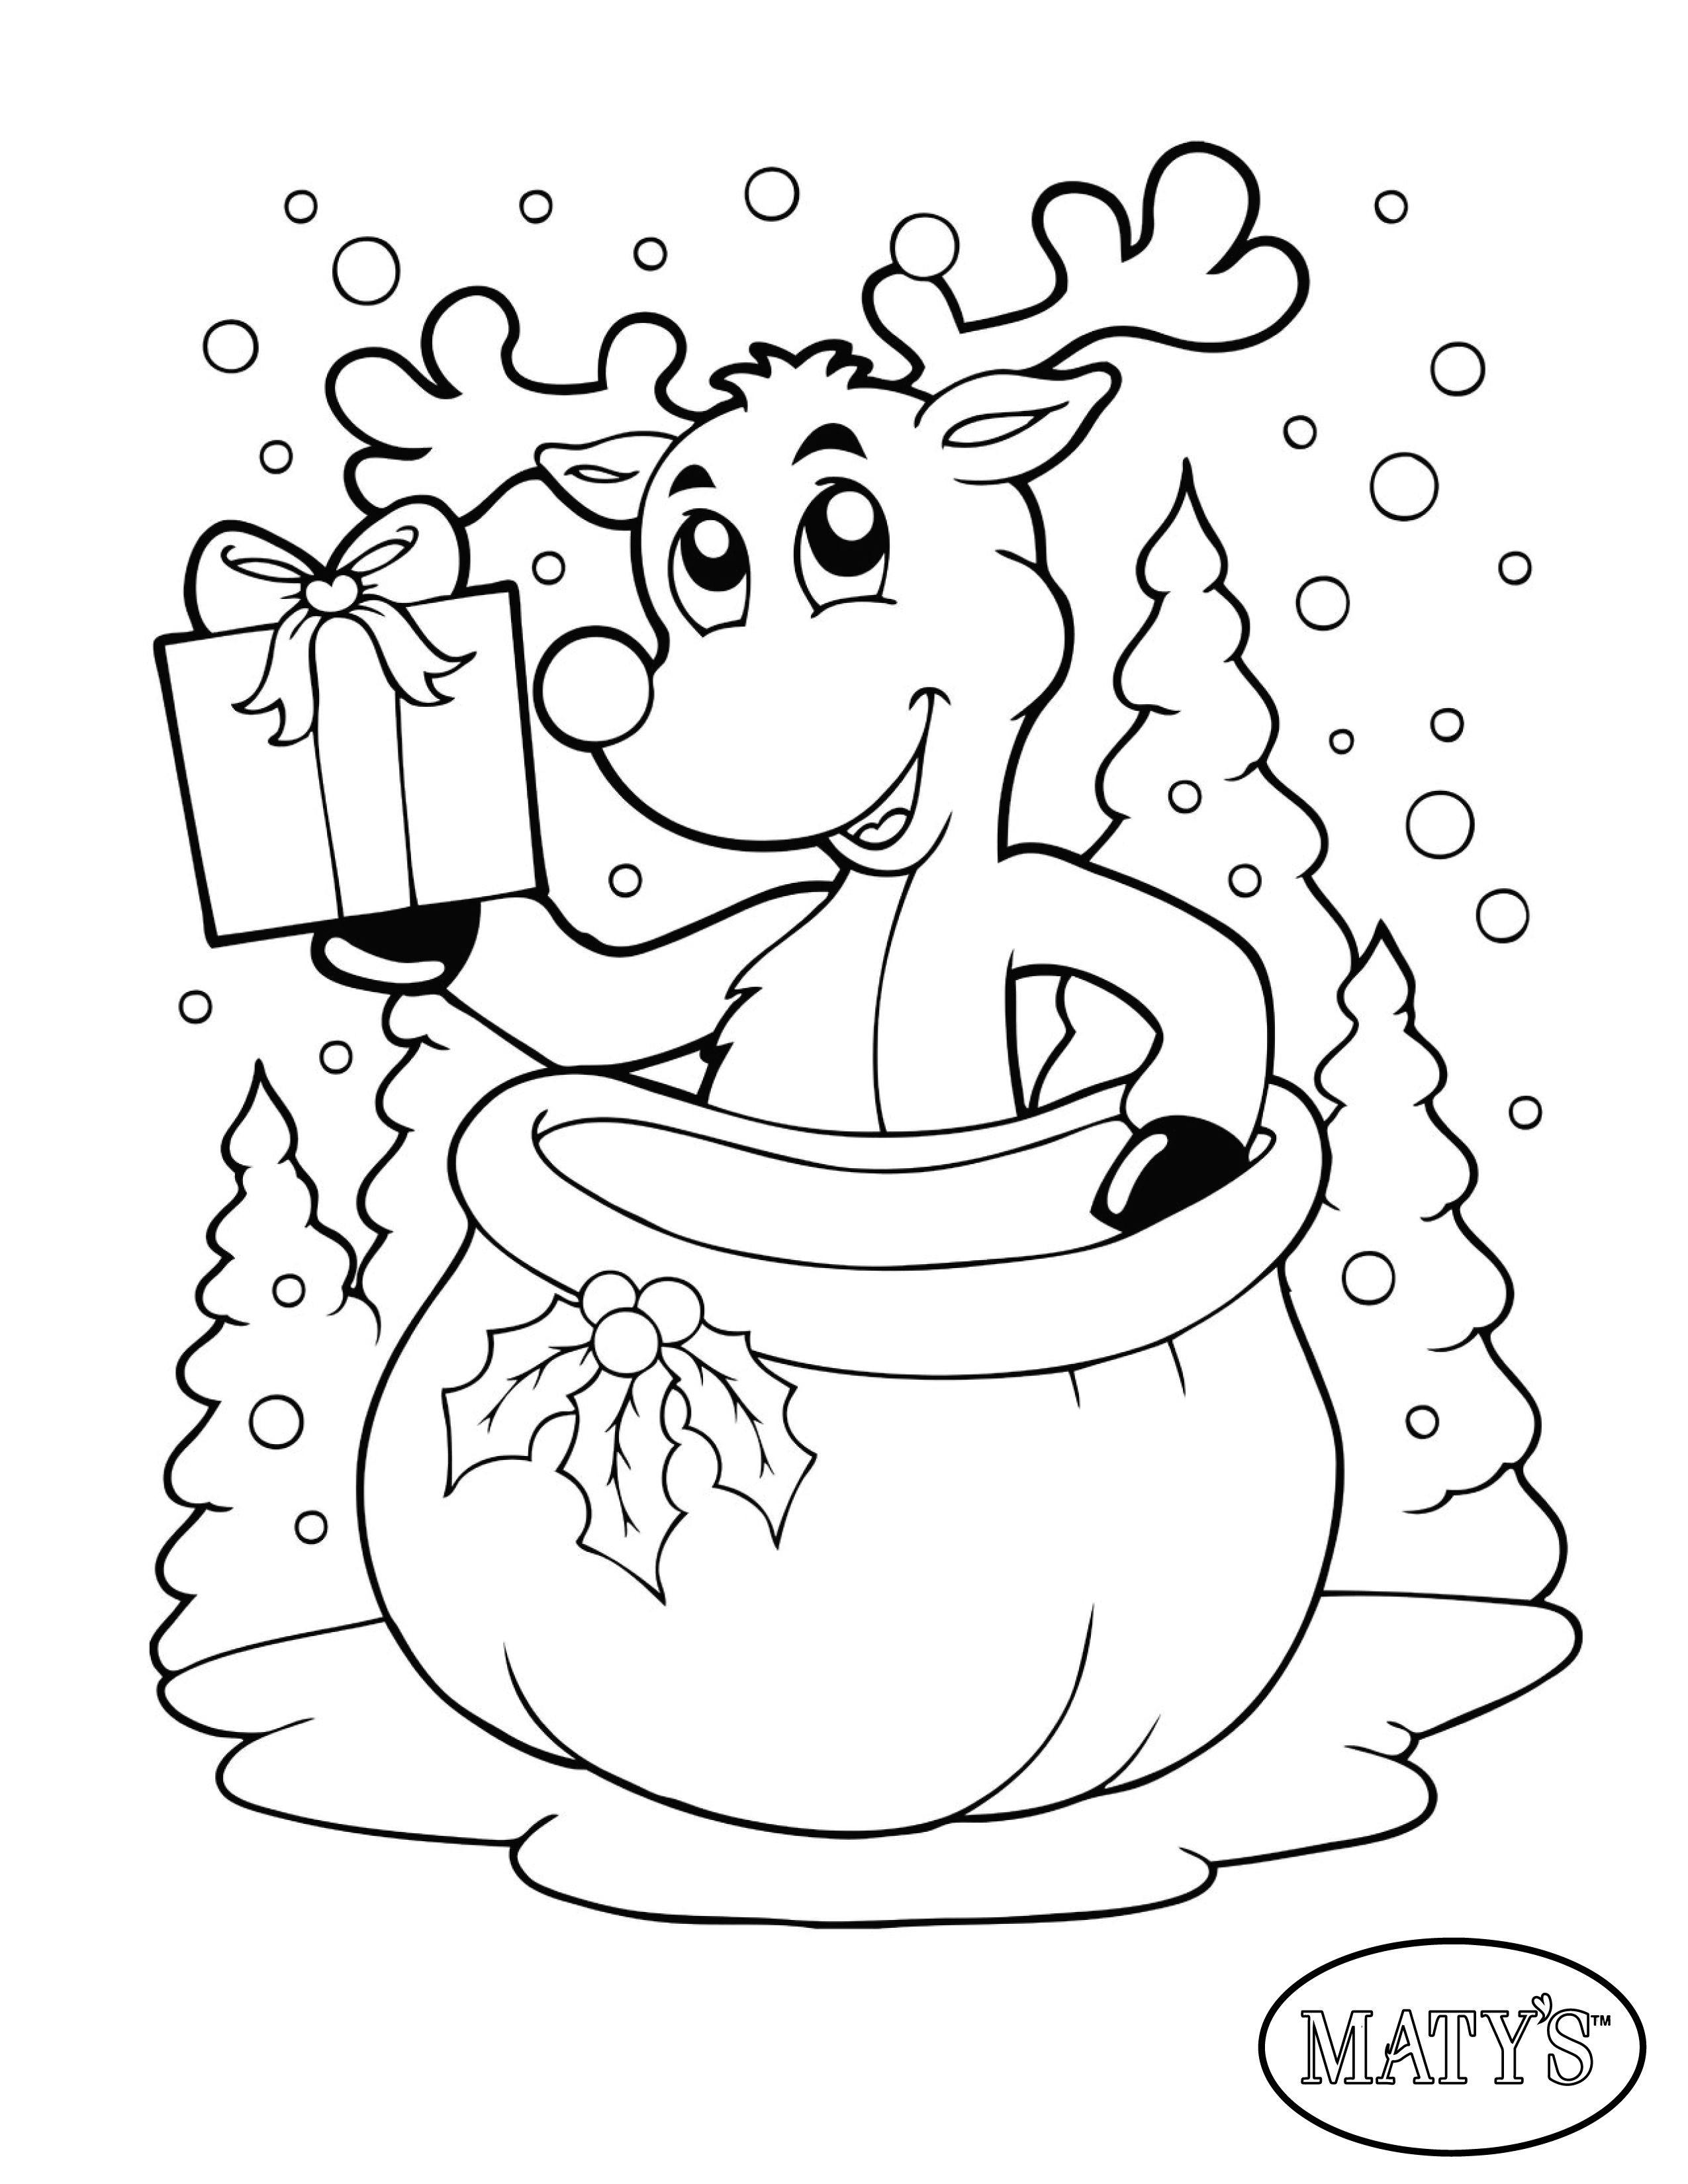 Ausmalbilder Weihnachten Winter Einzigartig Here S A Holiday Printable to Keep the Kids Busy while You Fotografieren